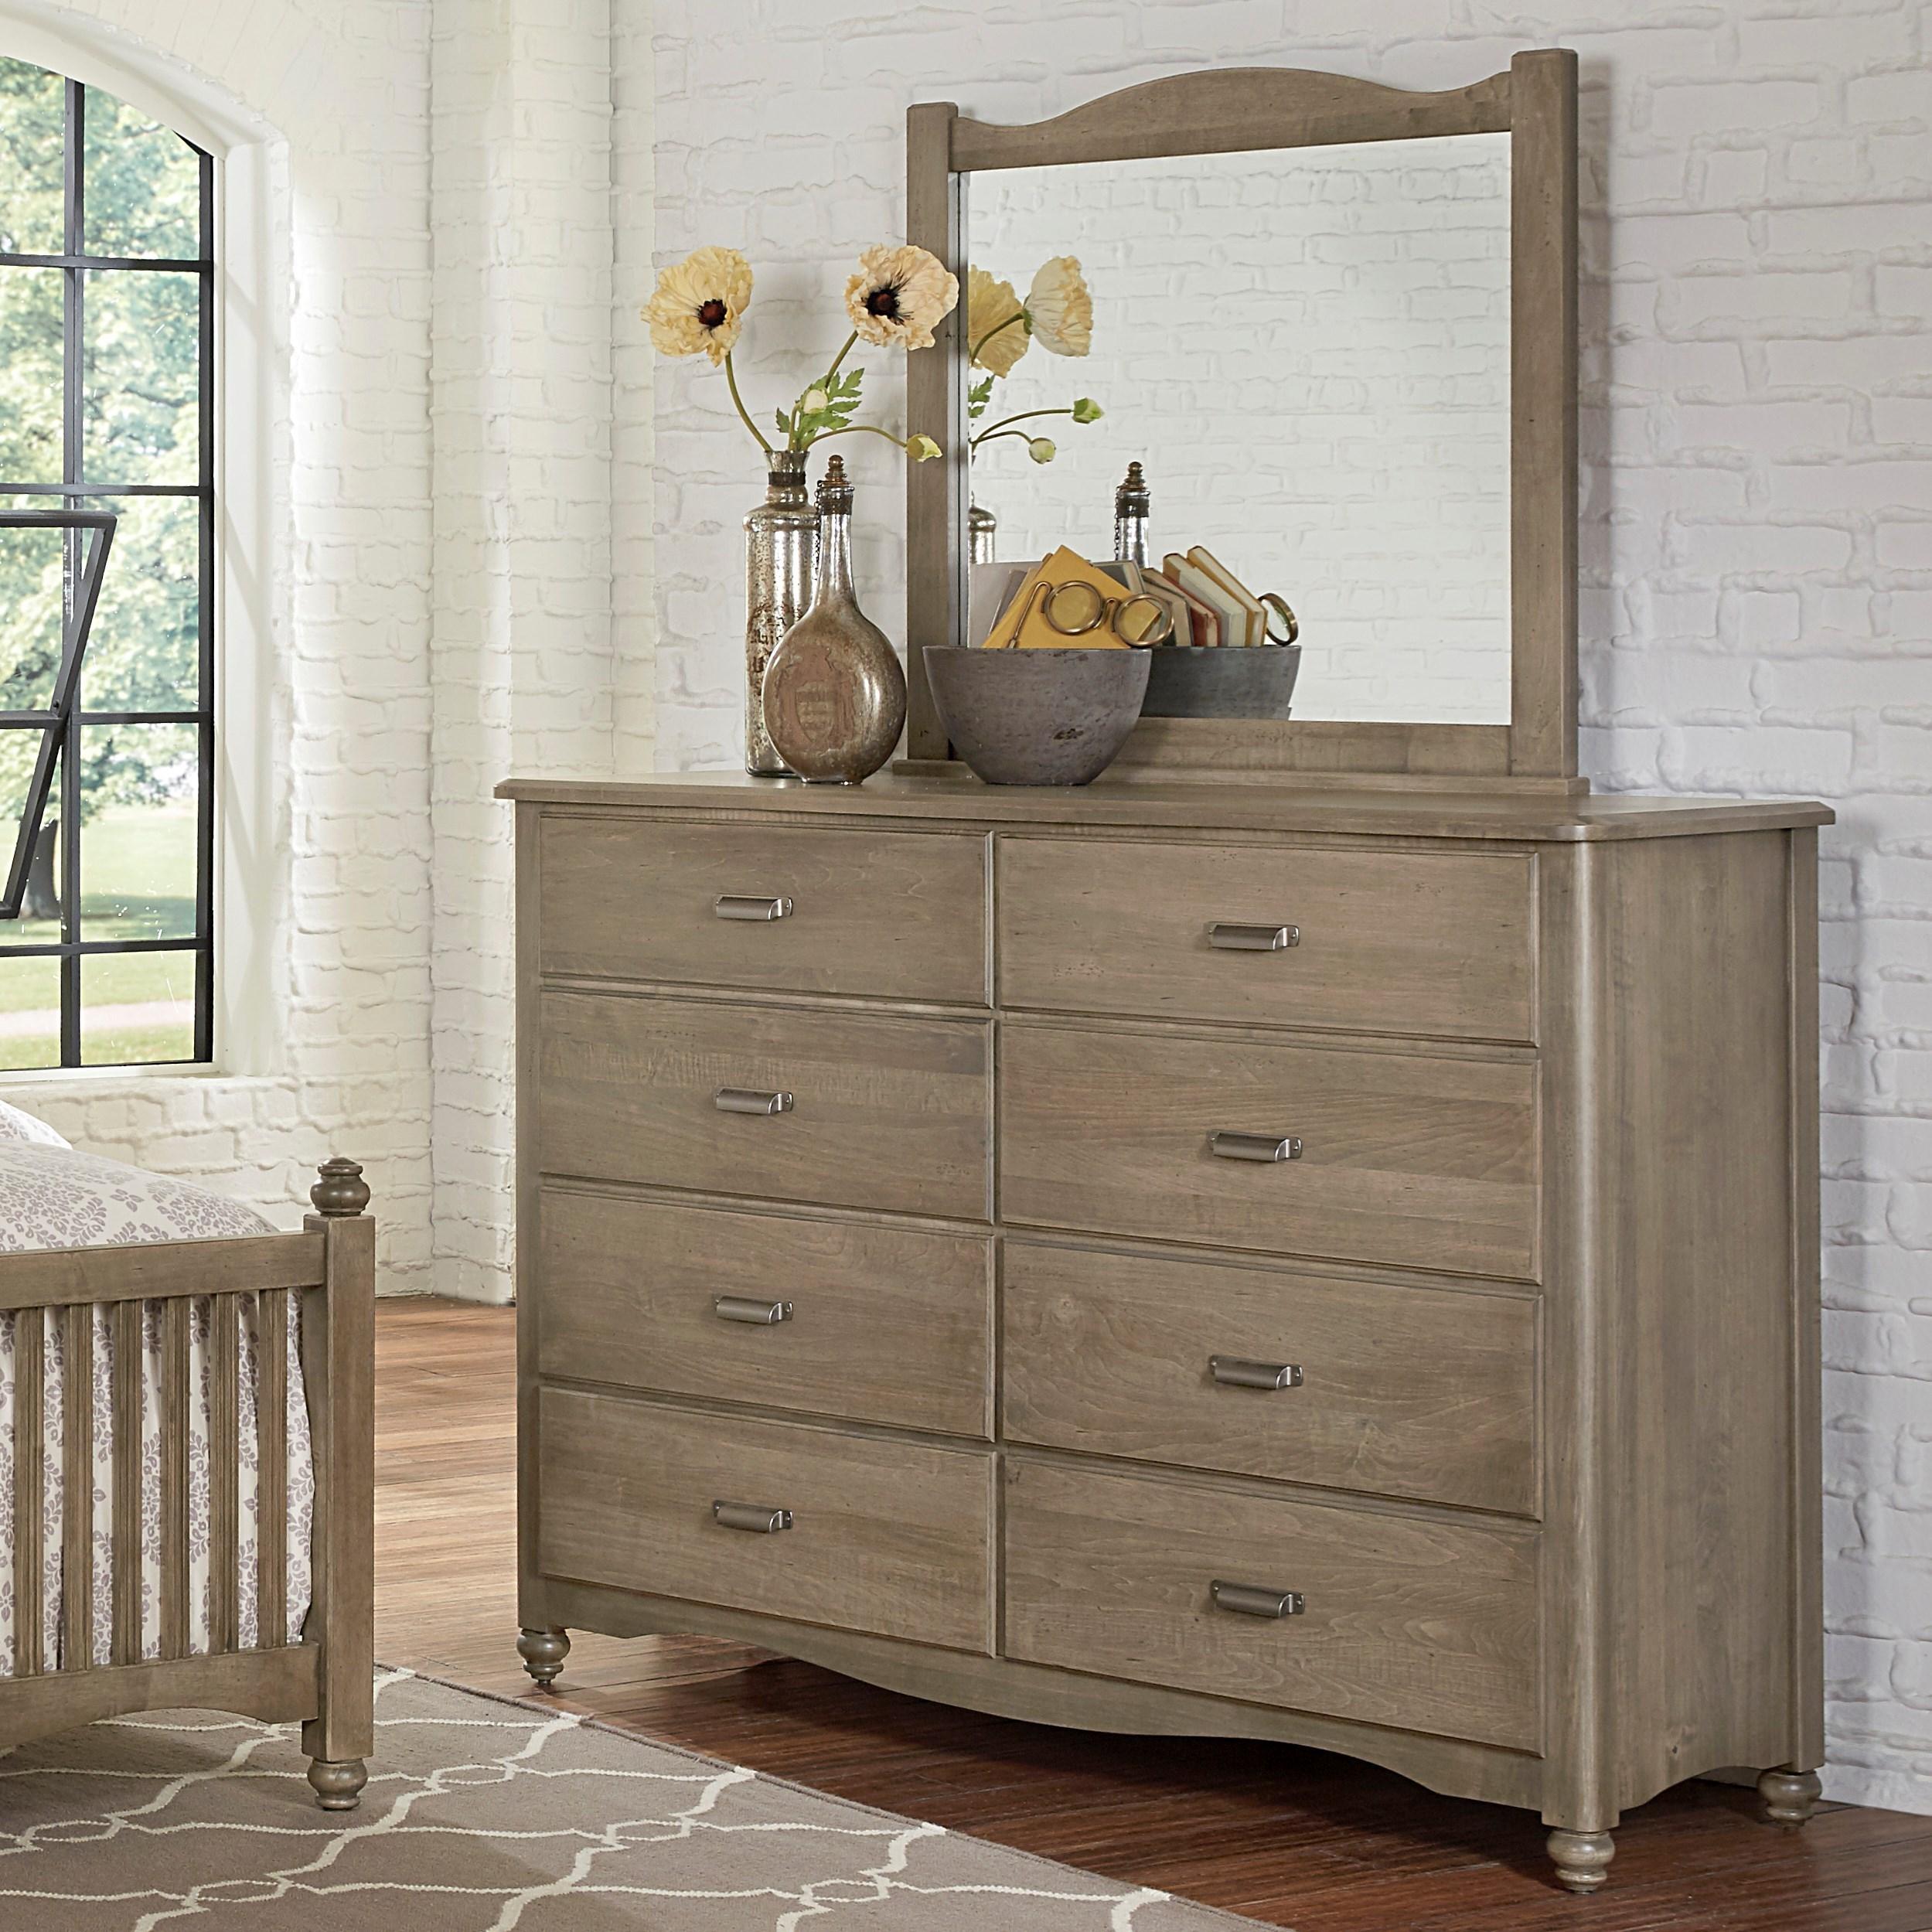 Vaughan bassett american maple solid wood bureau landscape mirror lapeer furniture for Solid maple bedroom furniture